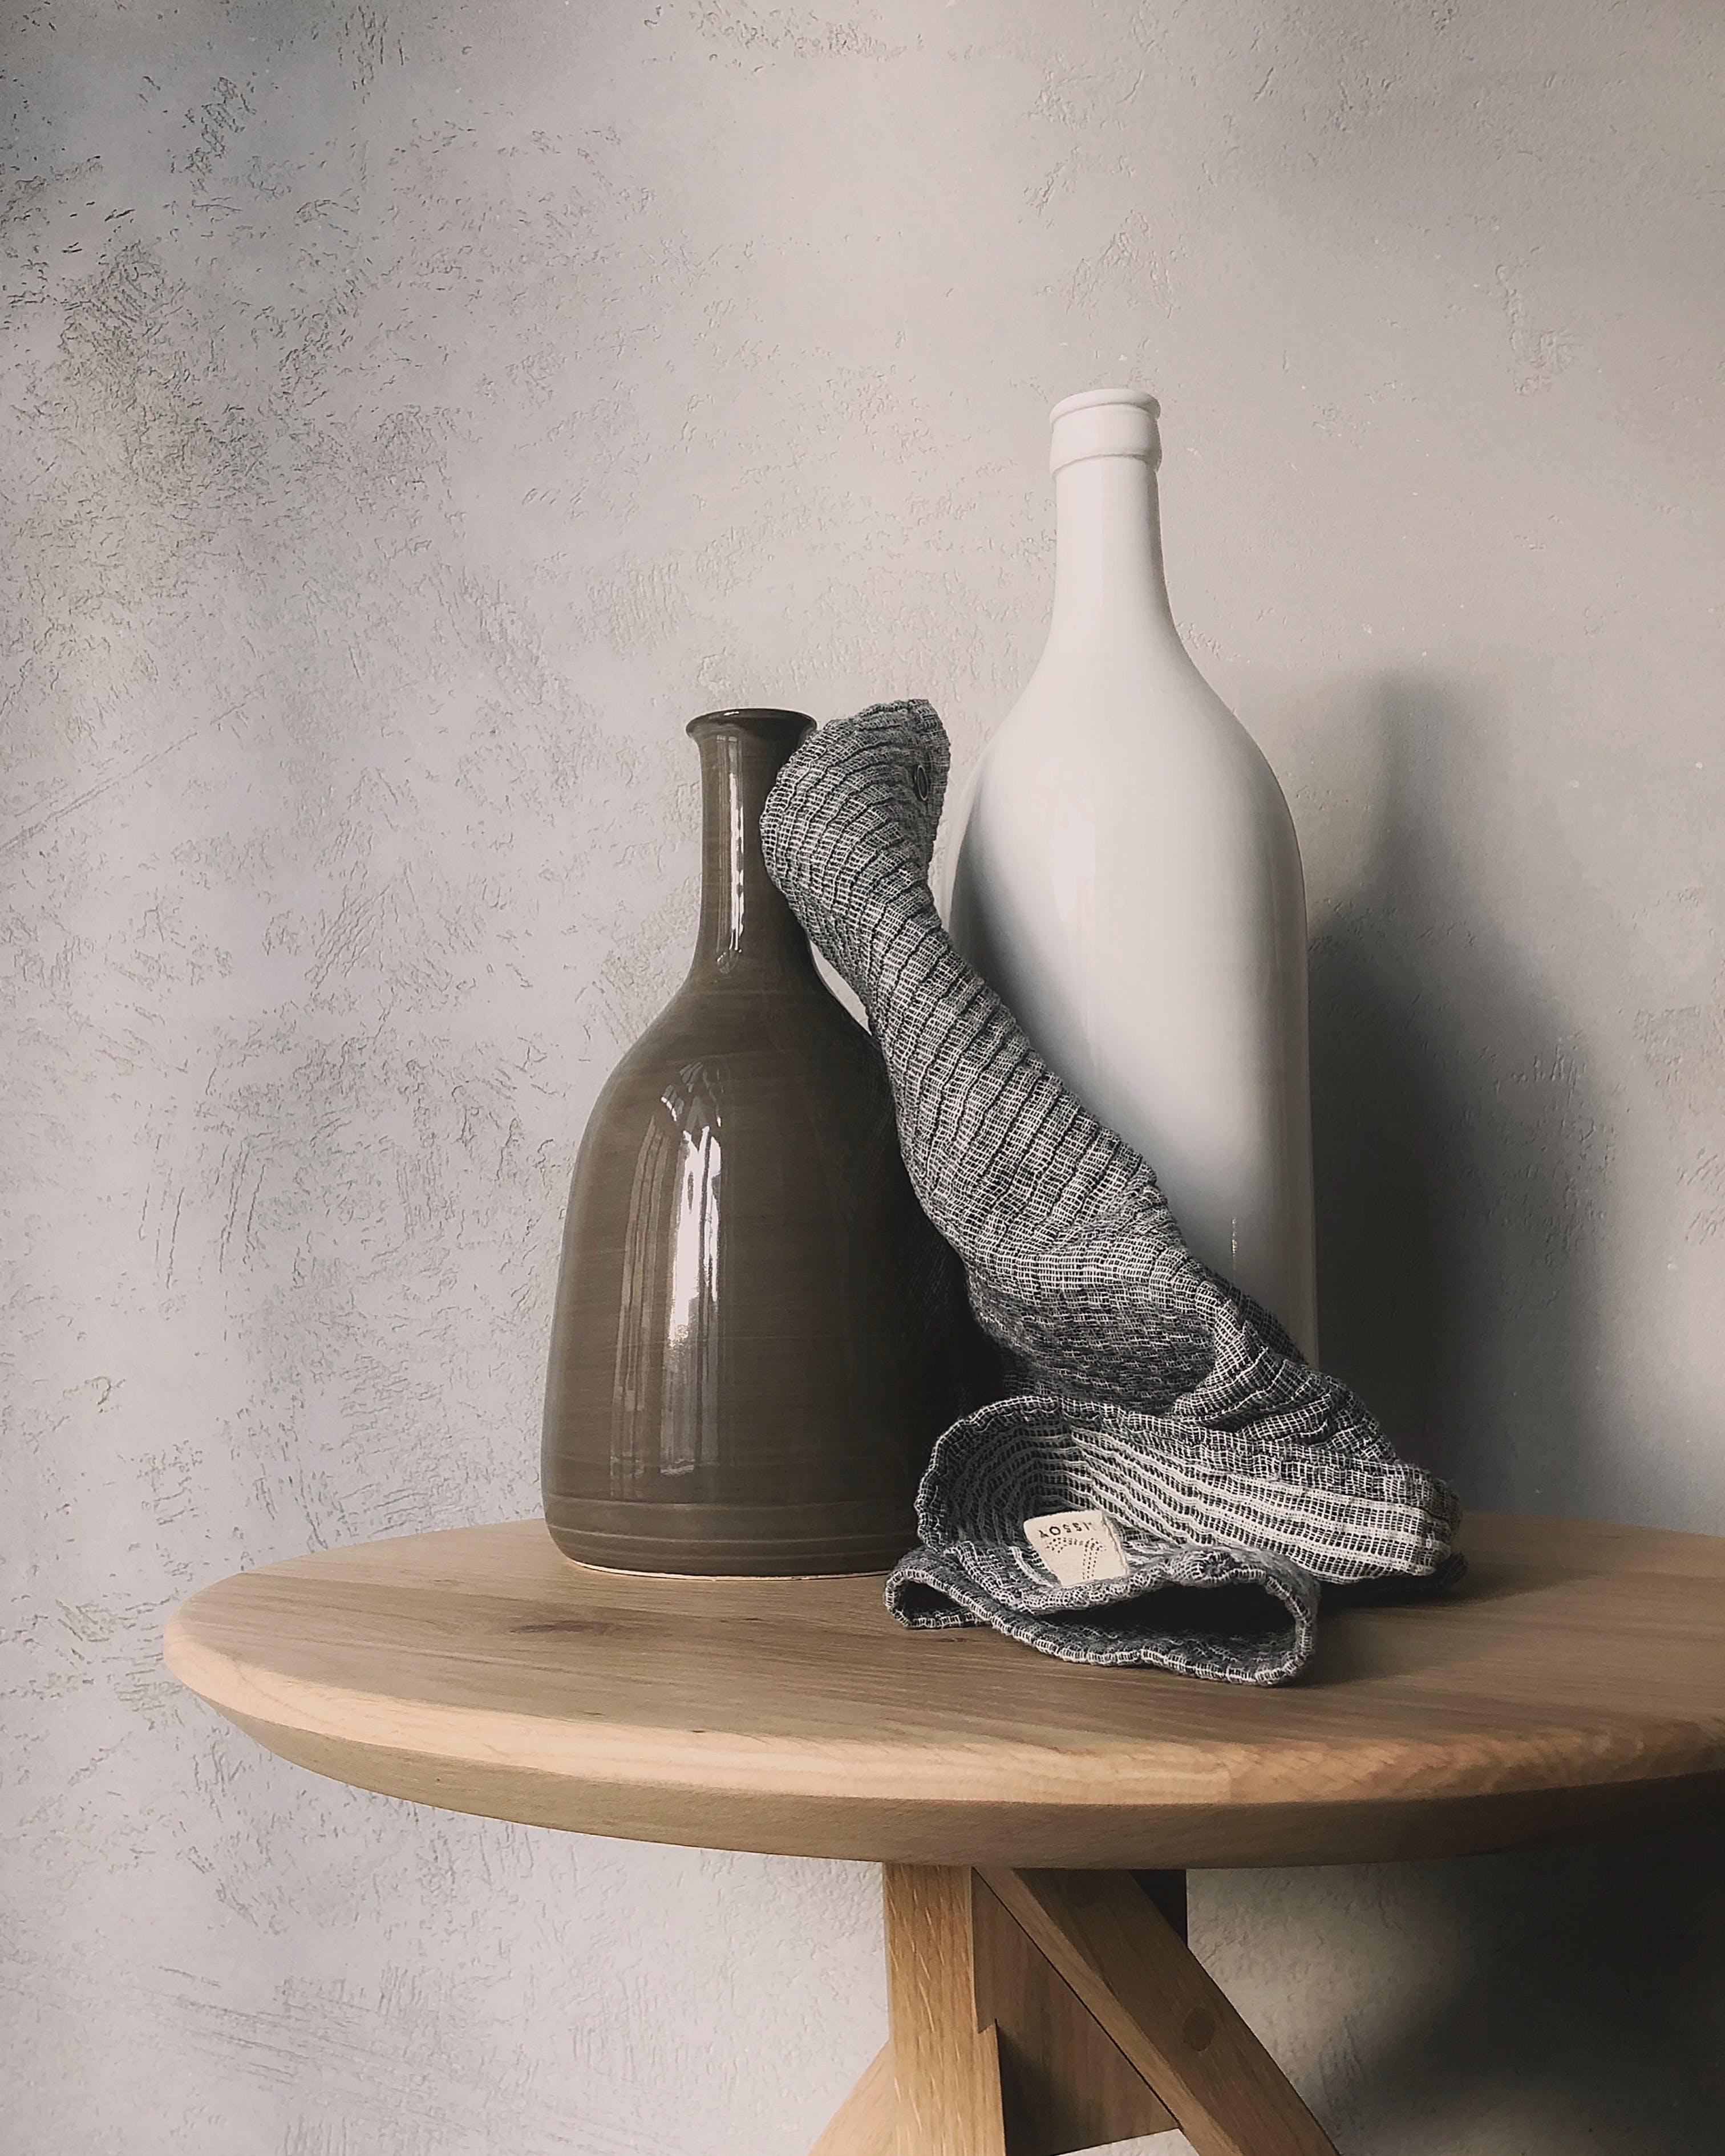 ampolles, ceràmica, contenidor